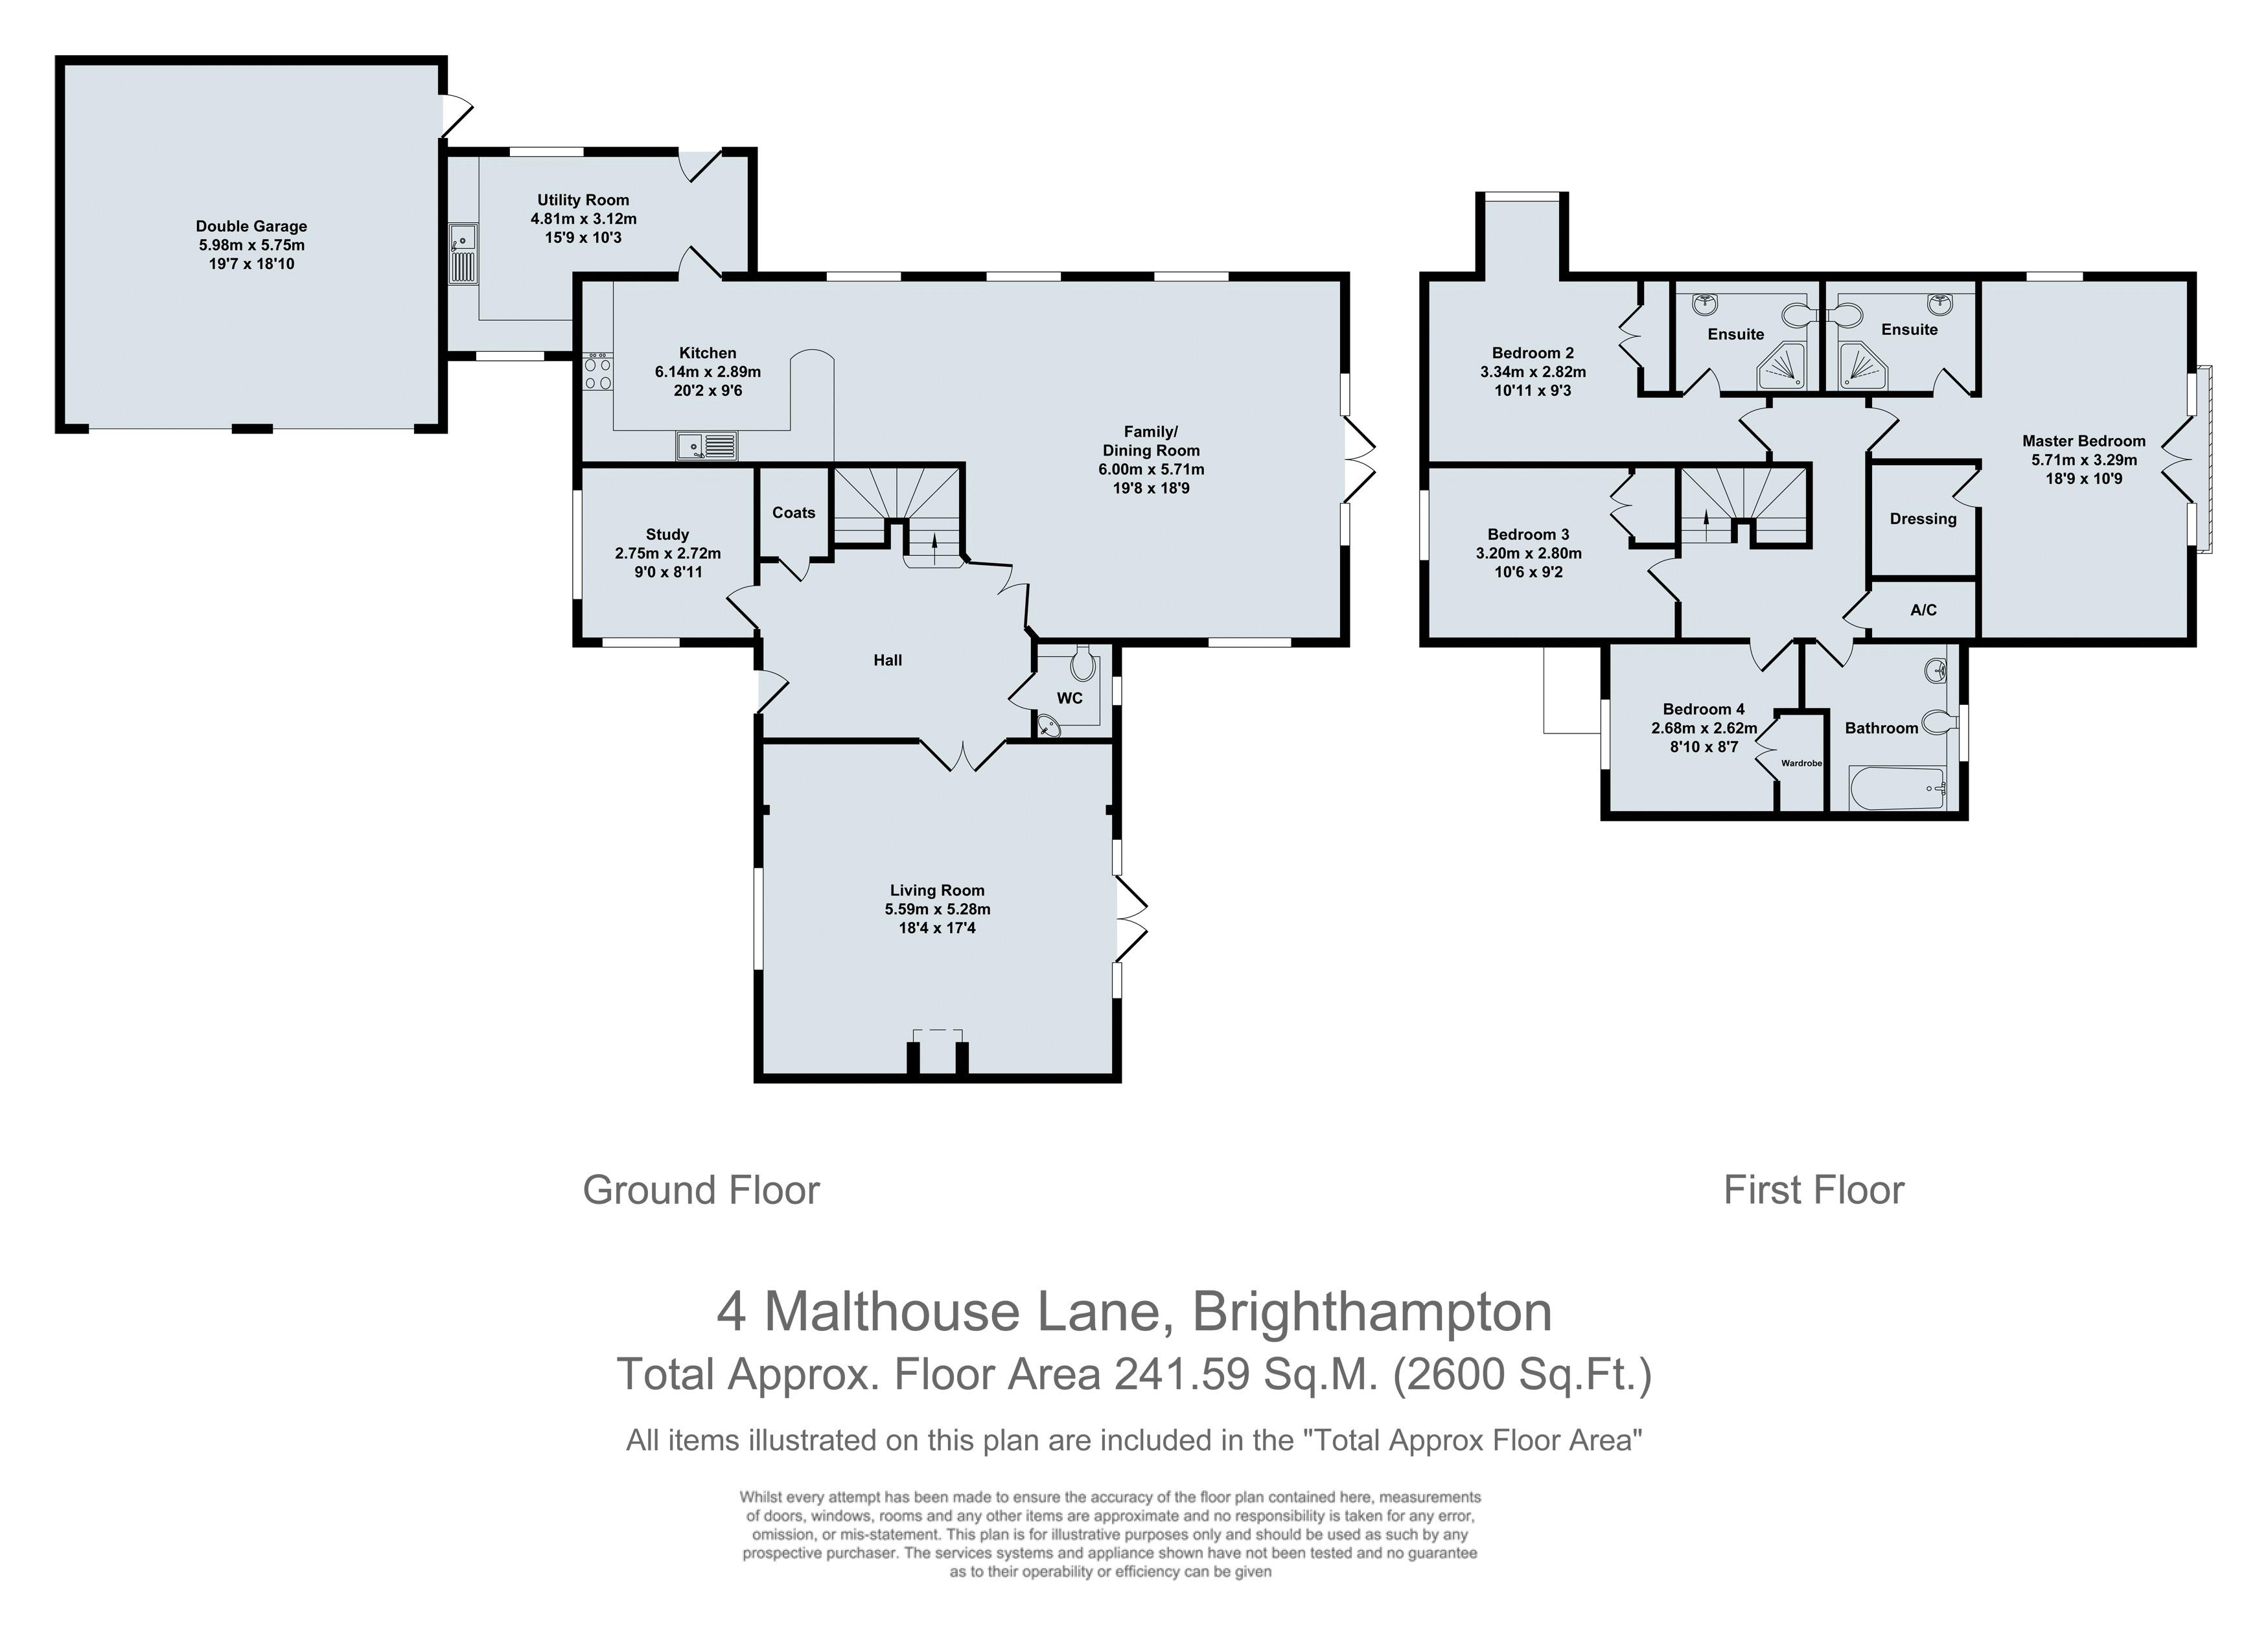 Malthouse Lane